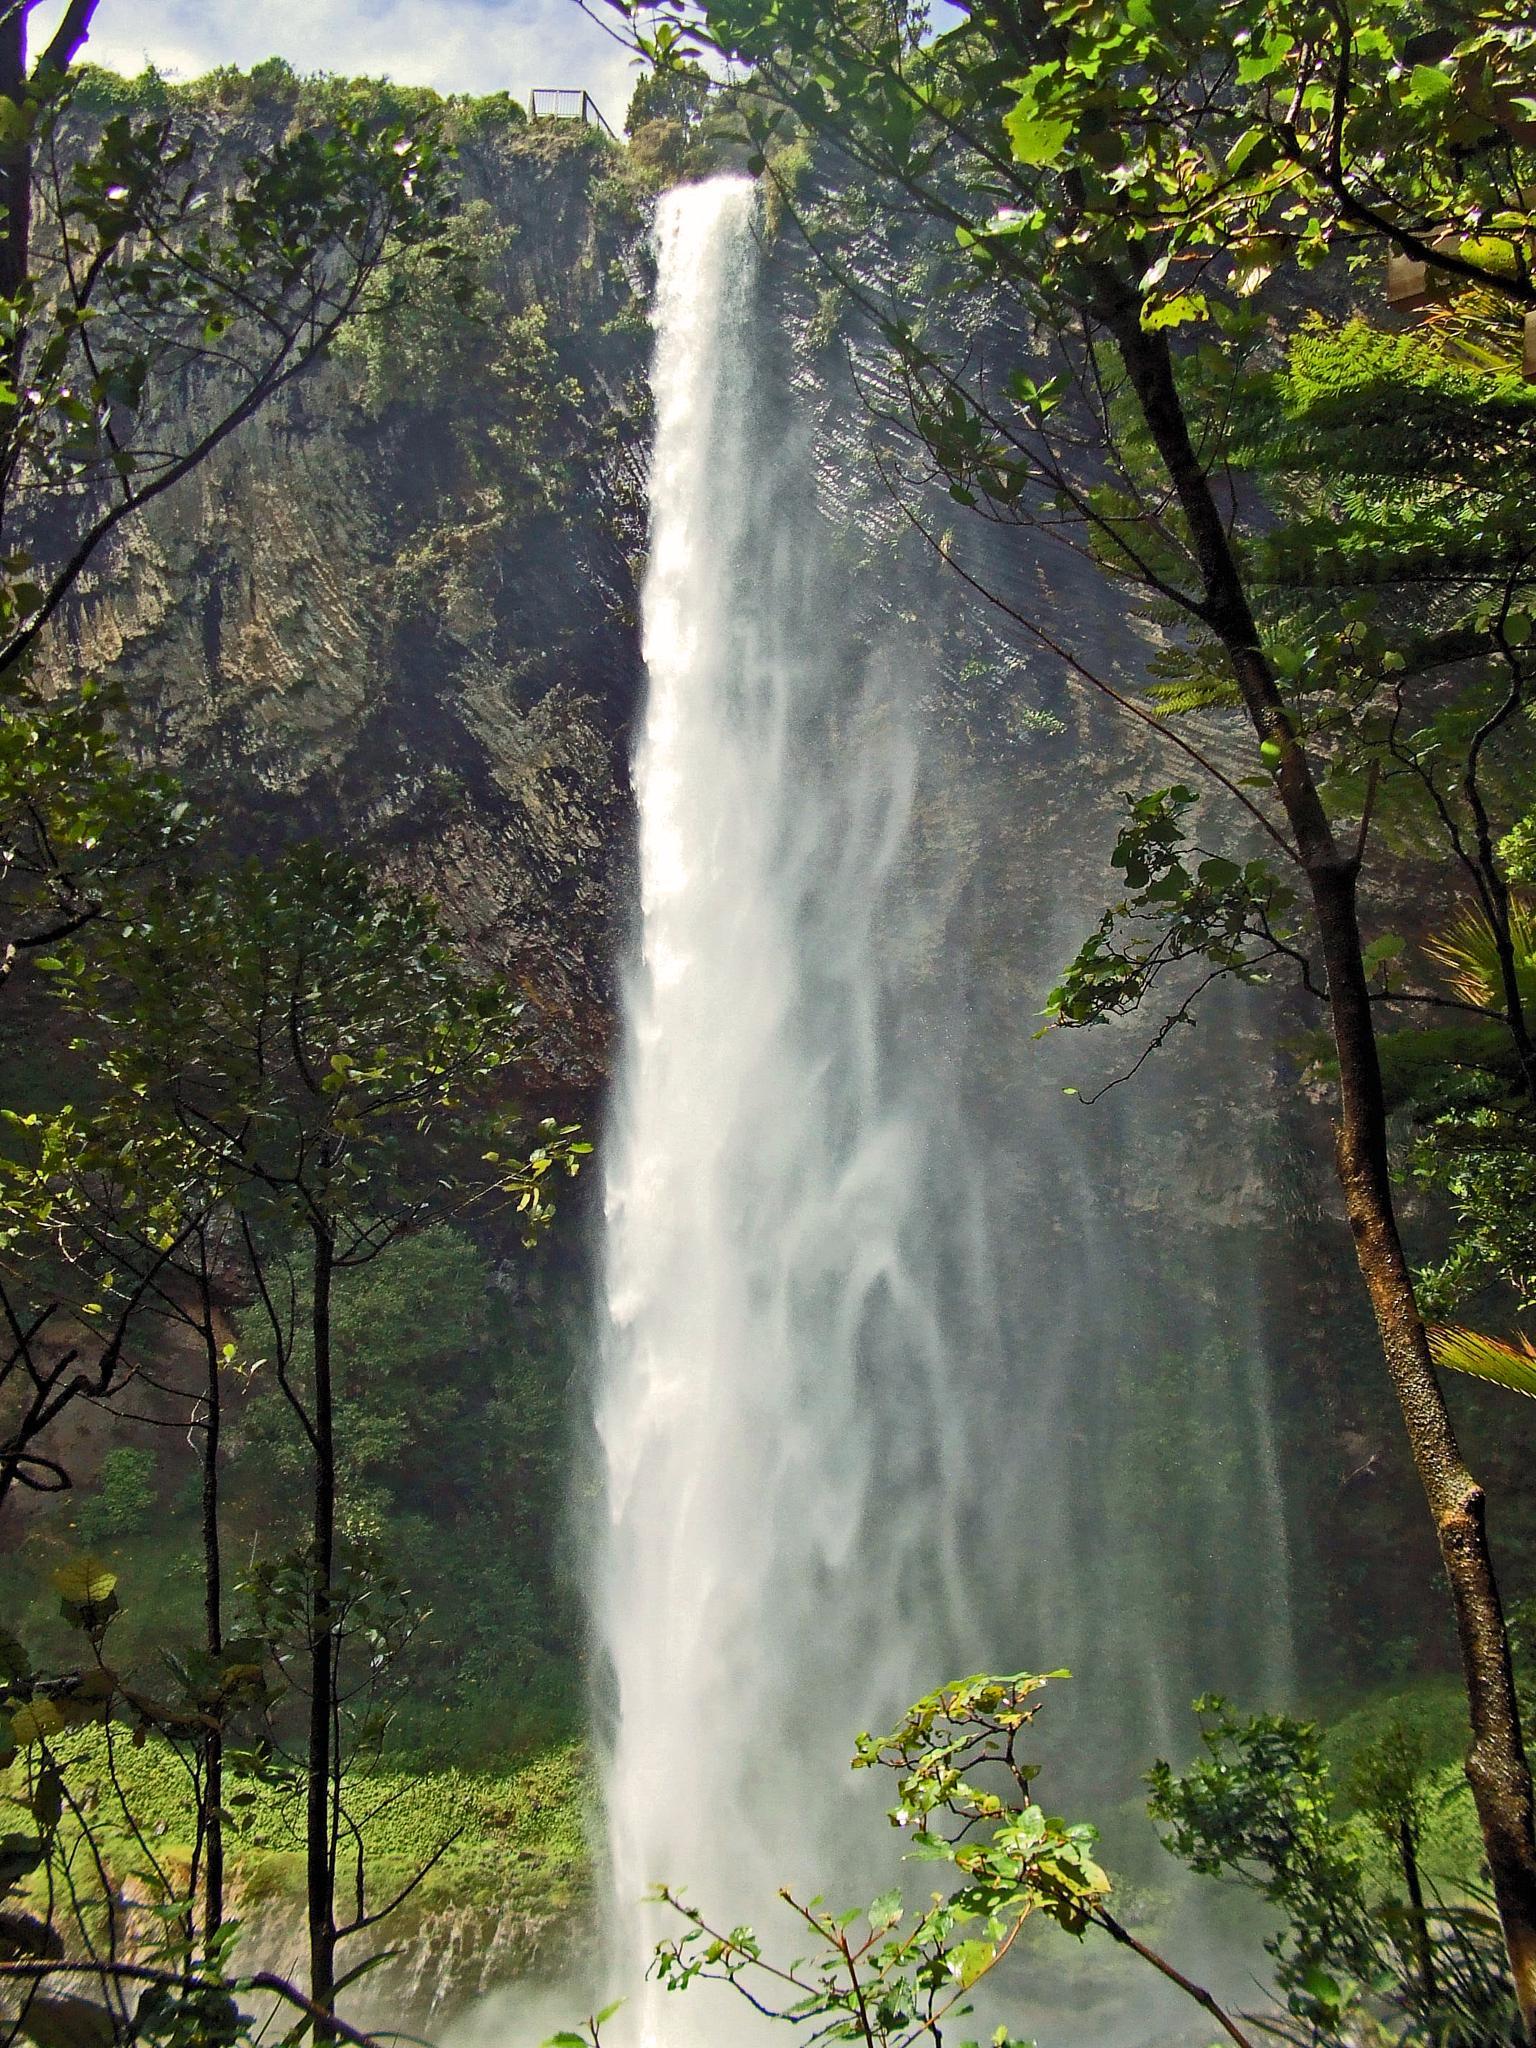 North Island Waterfall by kelrey31